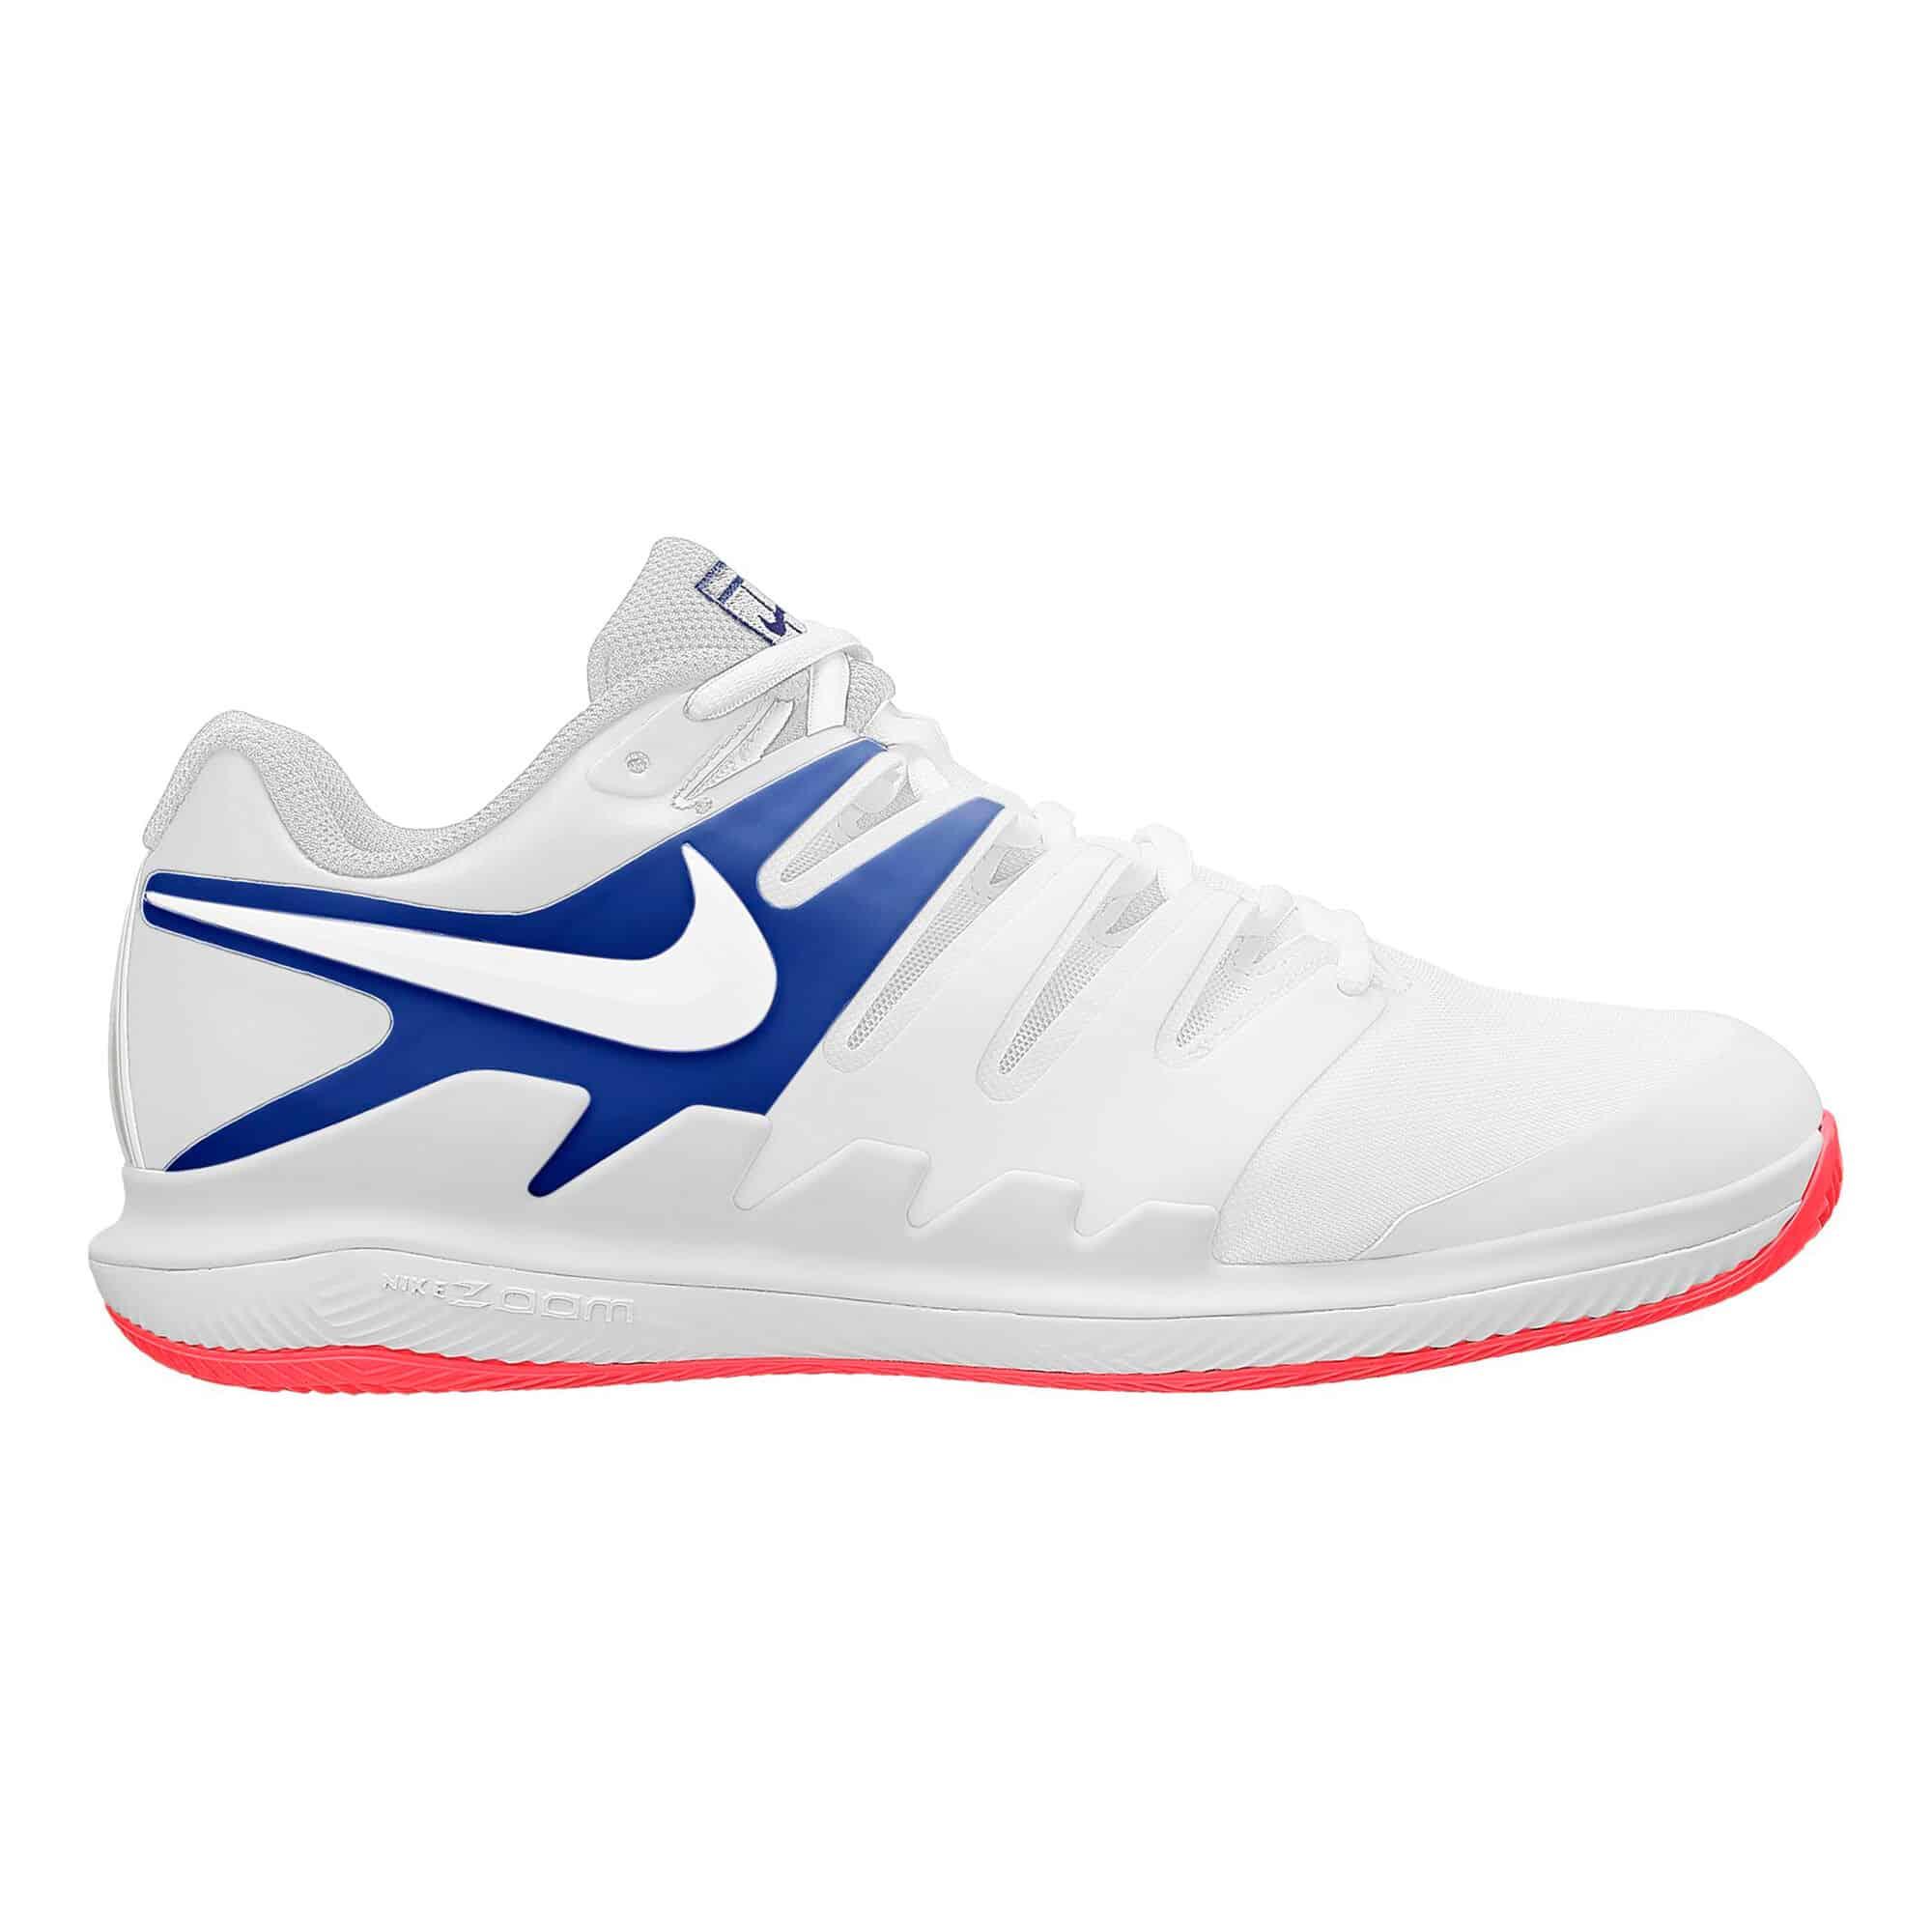 Nike Air Zoom Vapor X